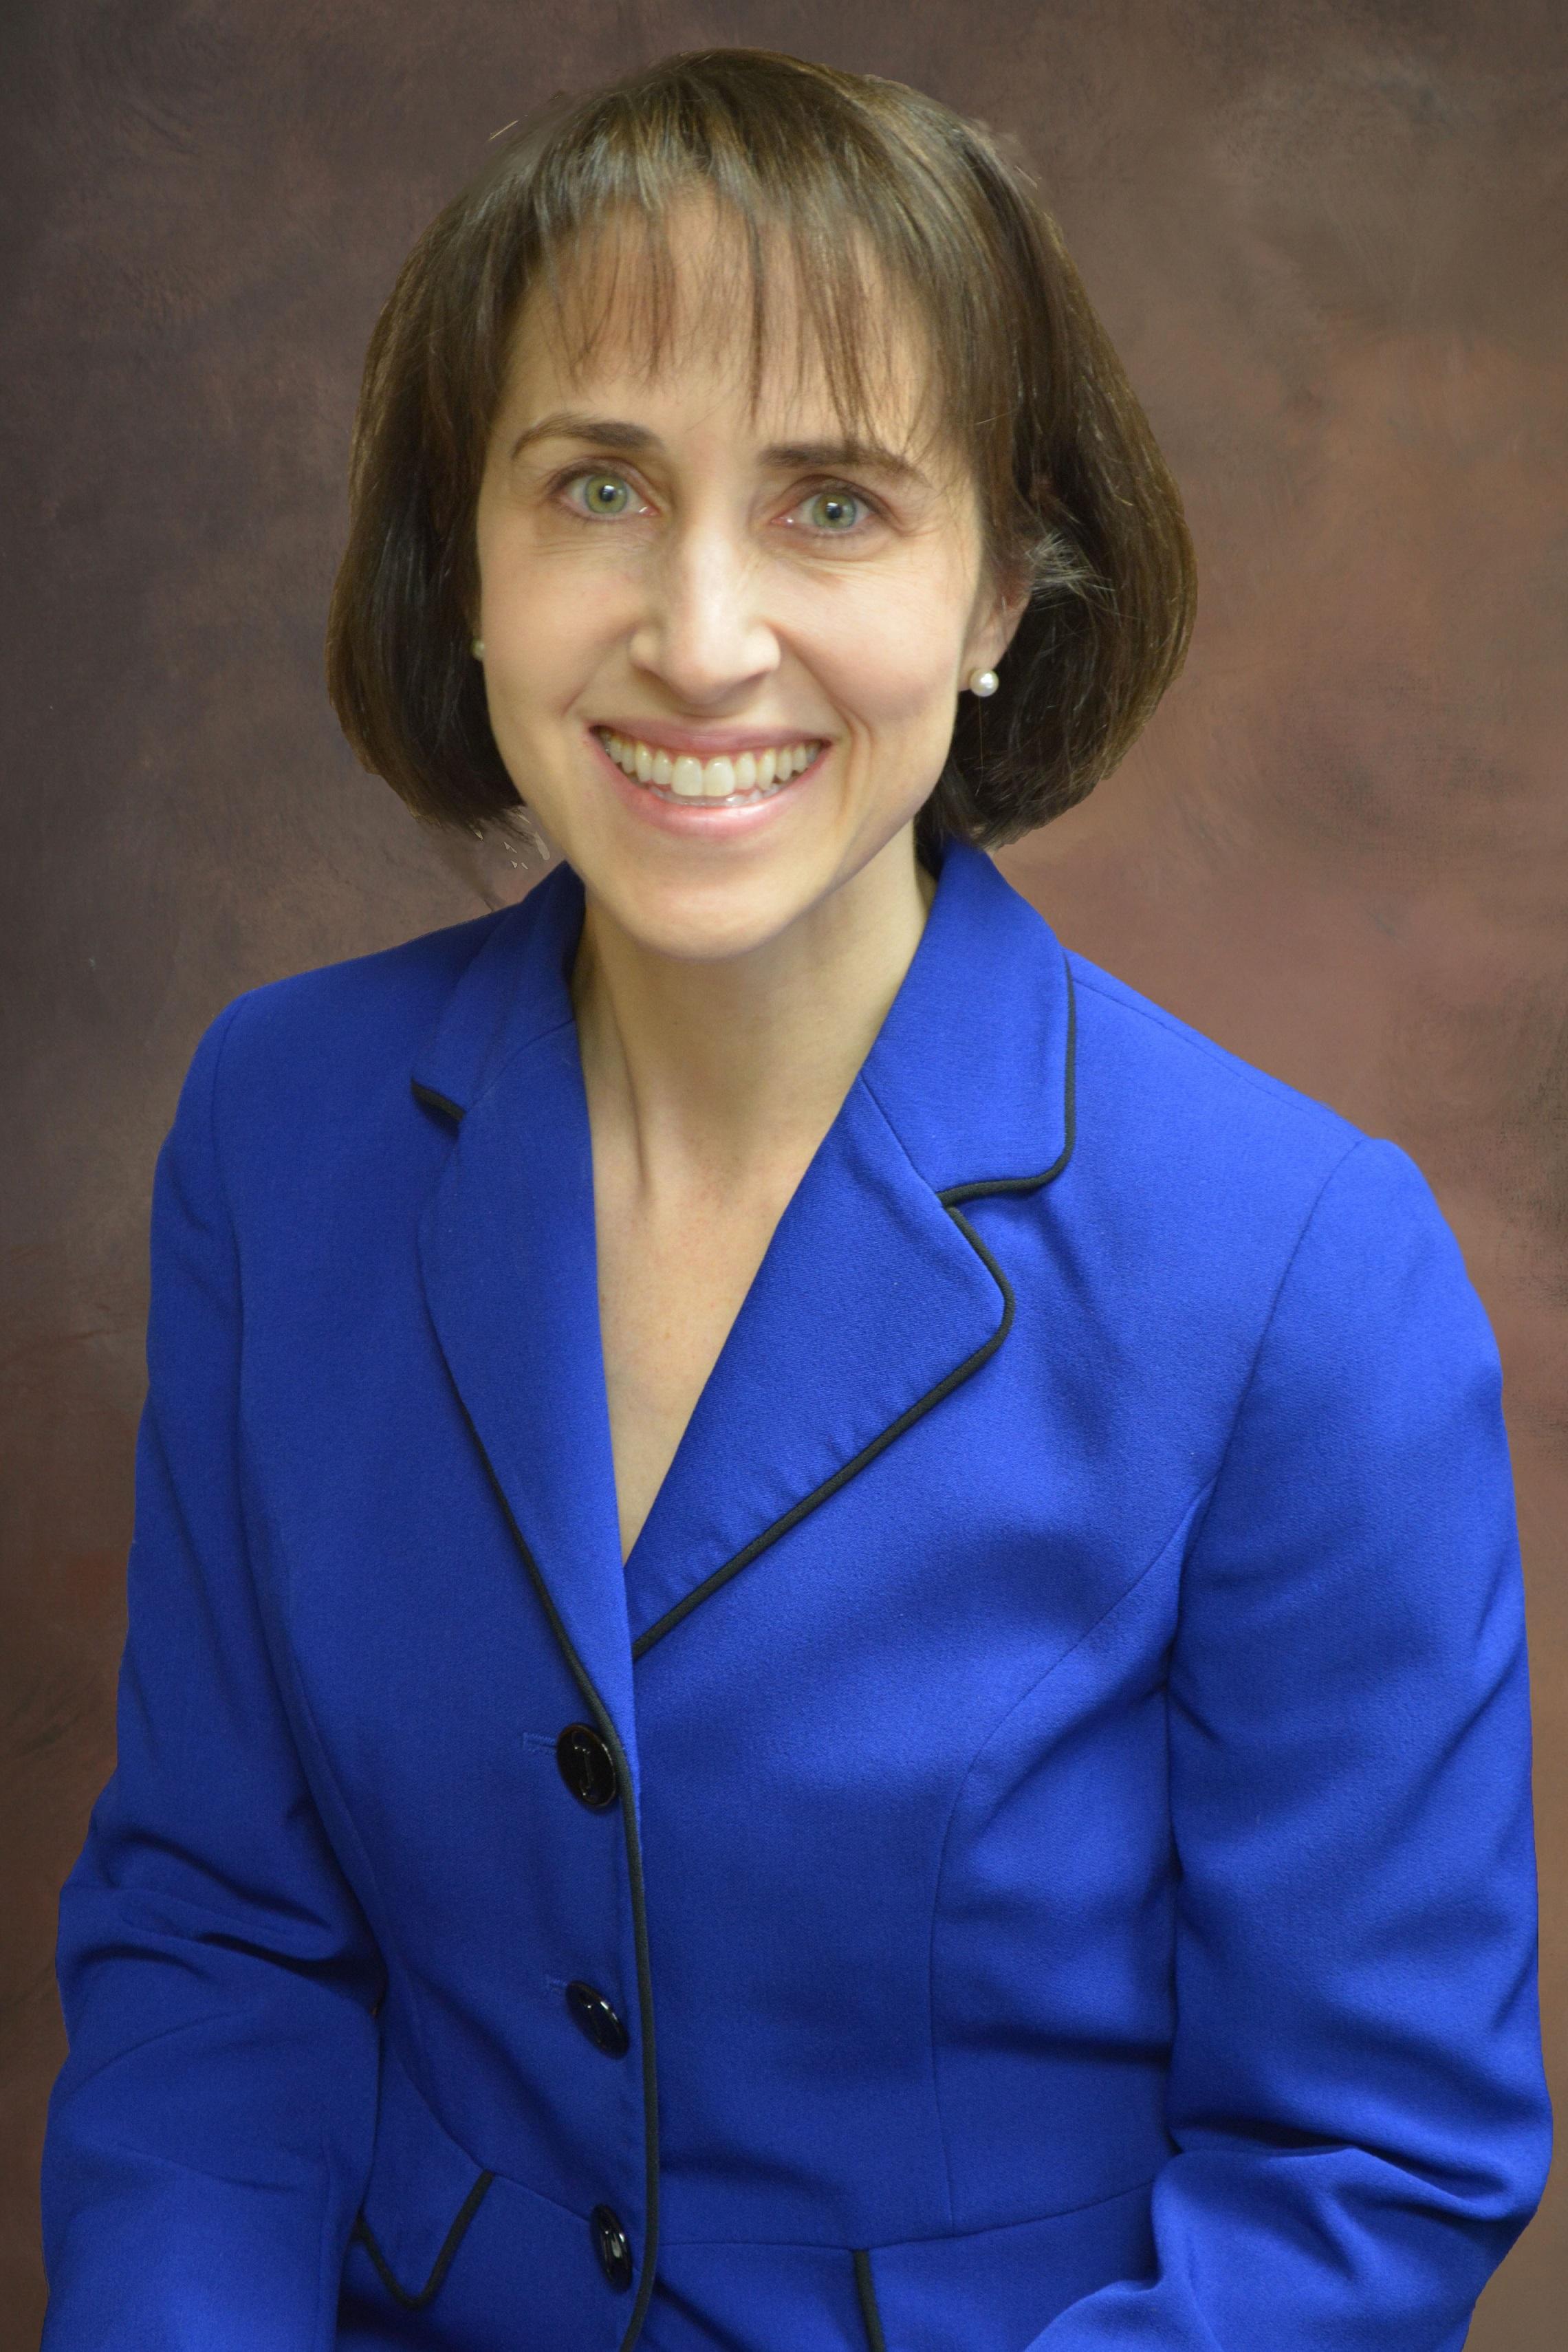 Rachel Belin